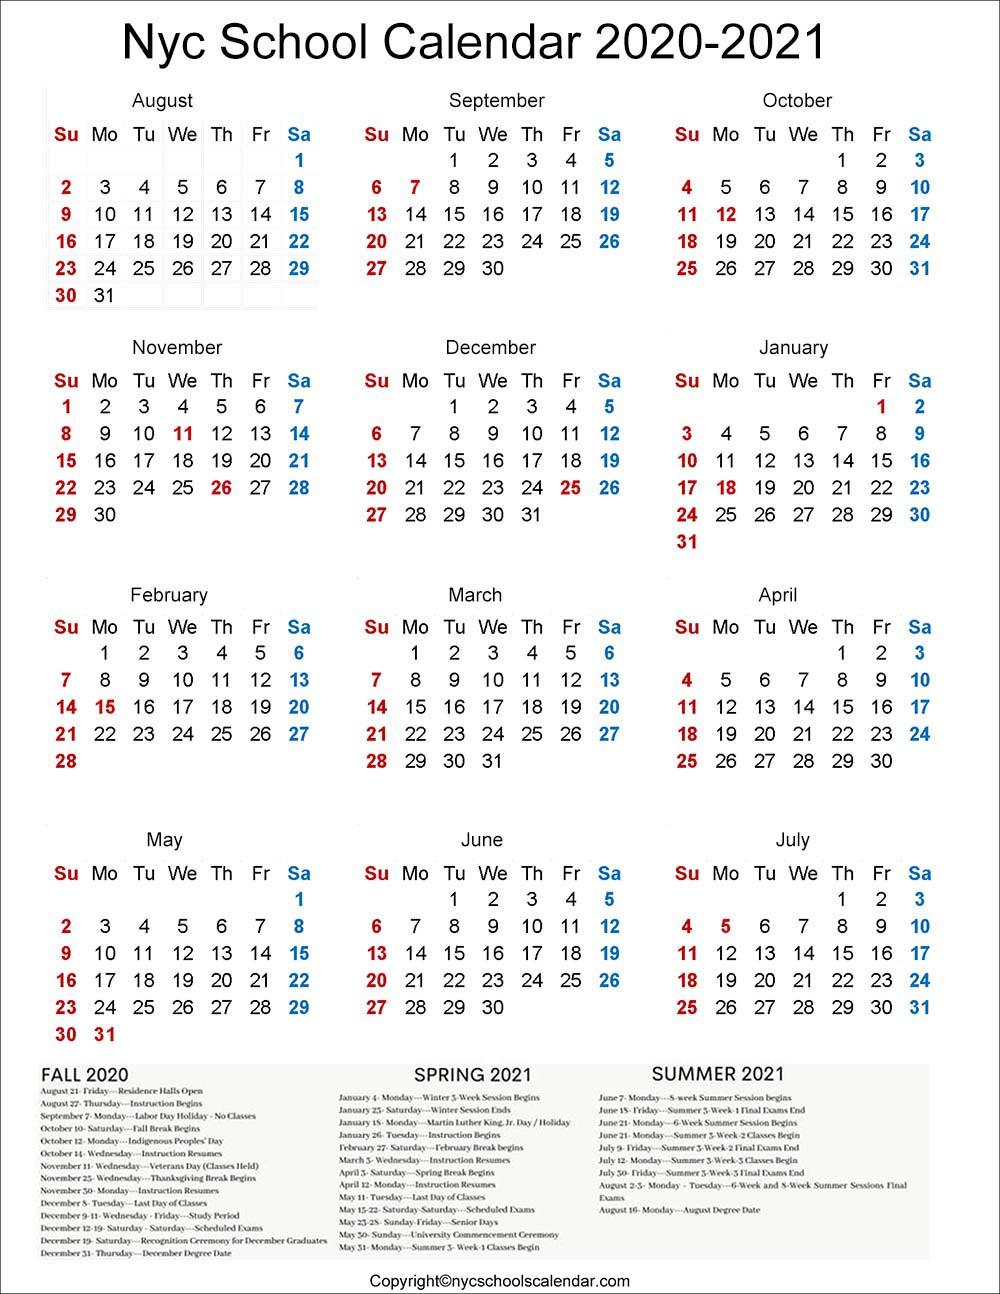 NYC School Holidays 2020 Calendar